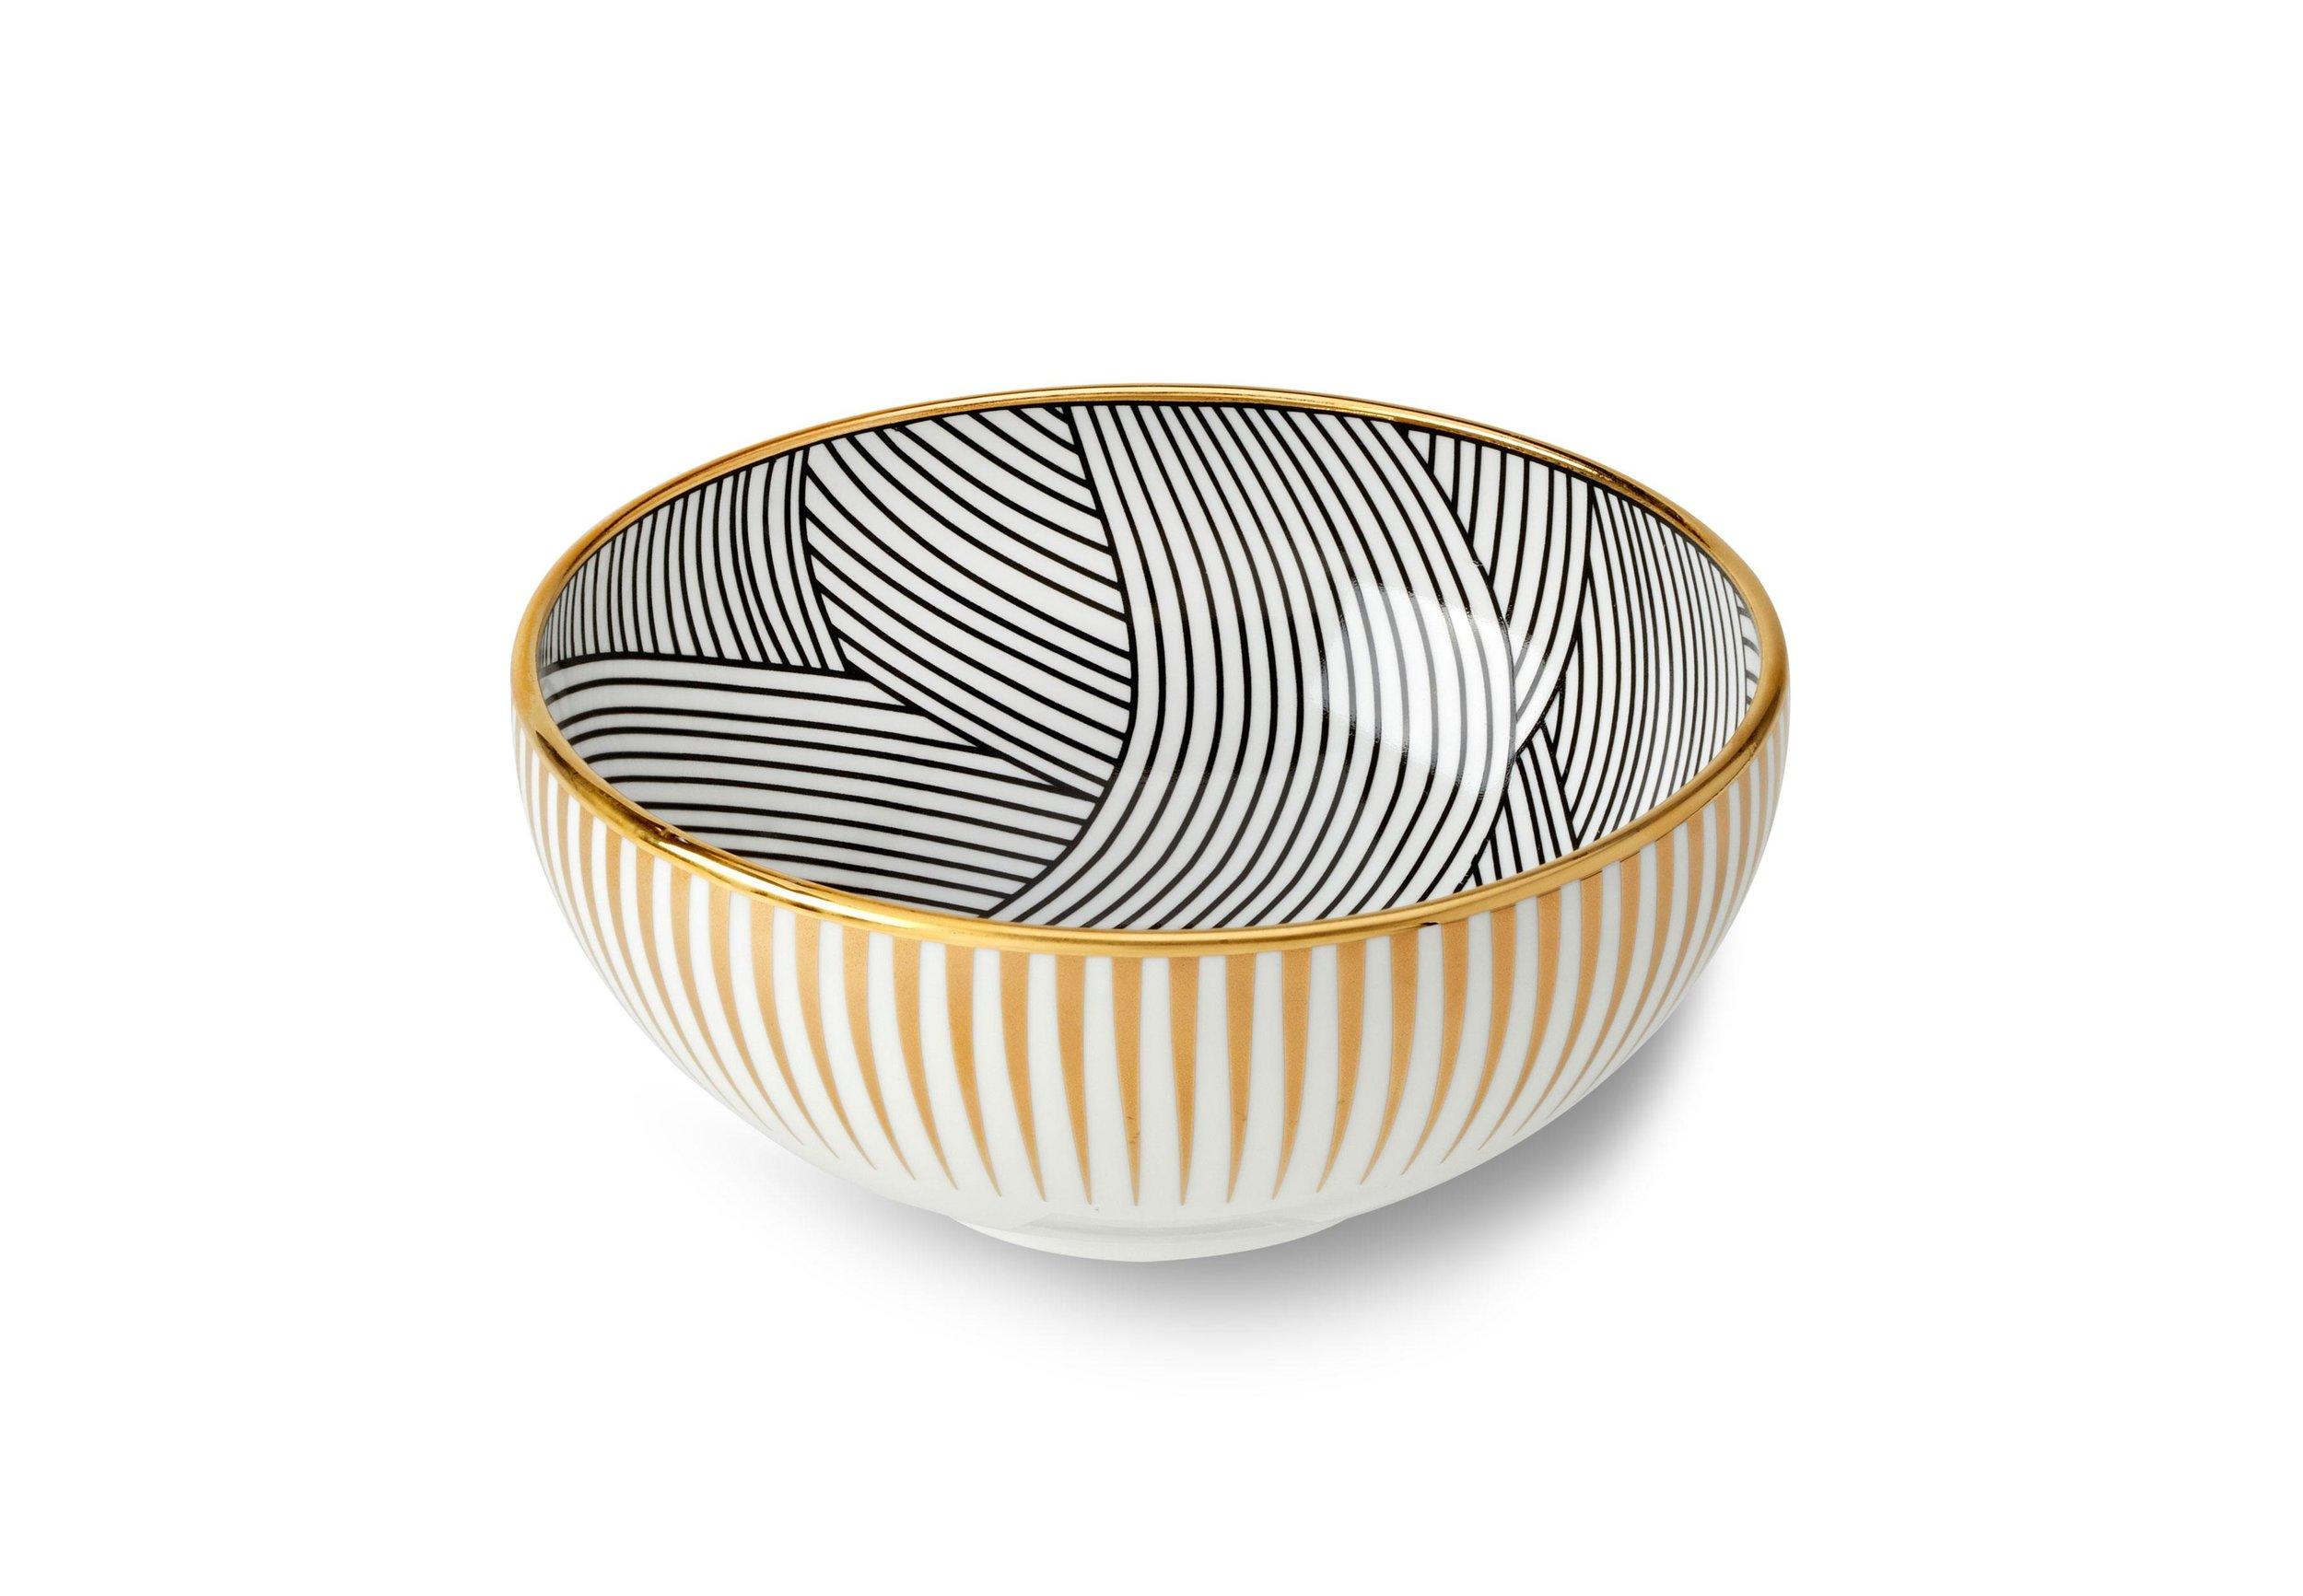 Lustre Bowl / Bethan Gray